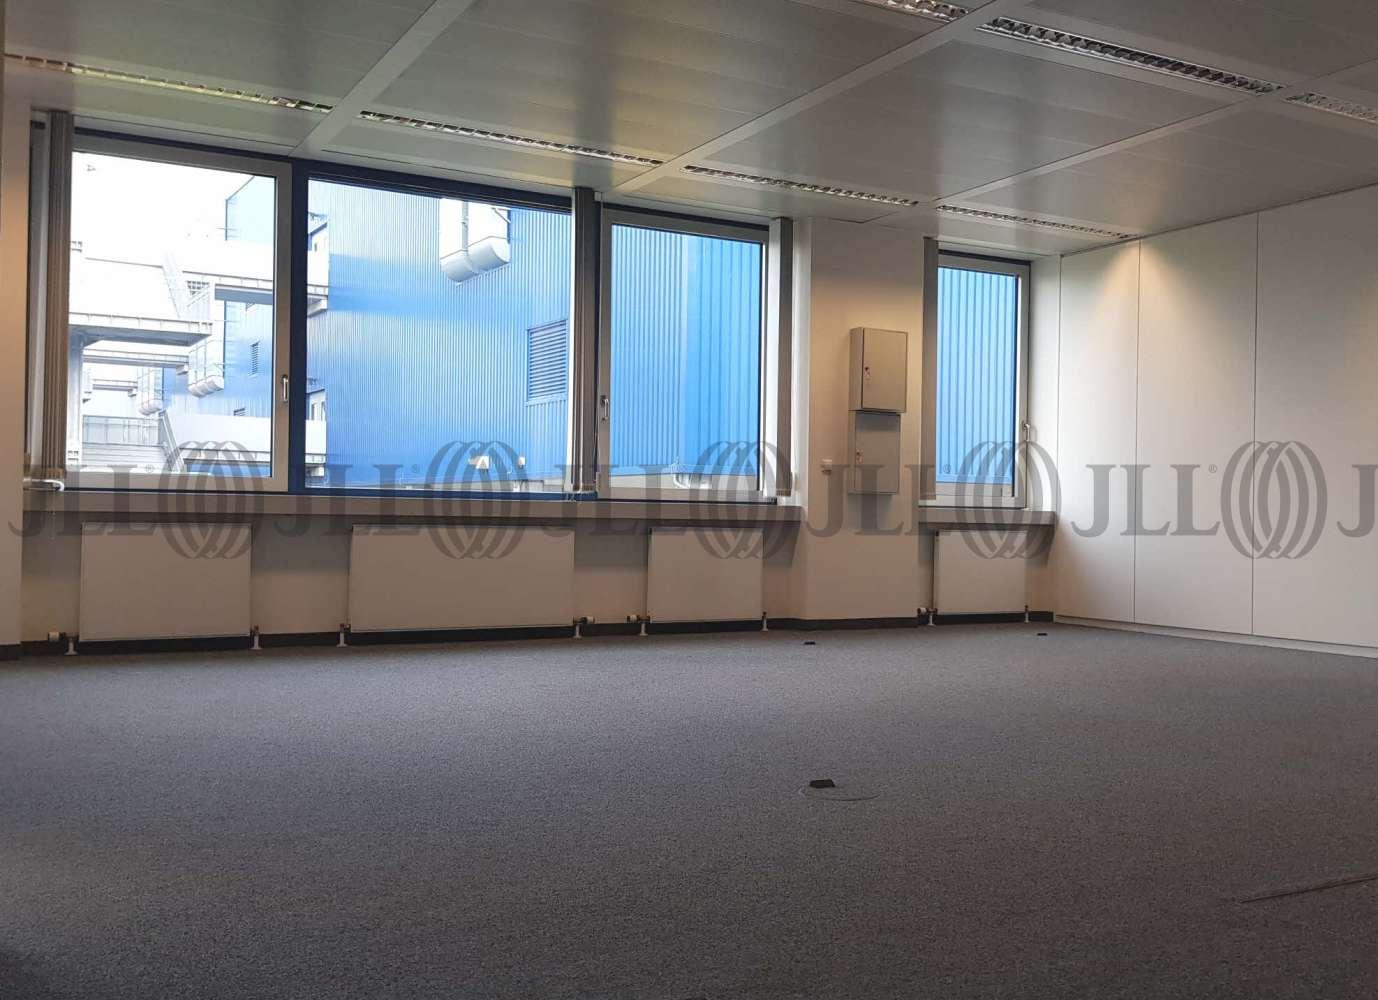 Büros Frankfurt am main, 60437 - Büro - Frankfurt am Main, Nieder-Eschbach - F1908 - 10645642